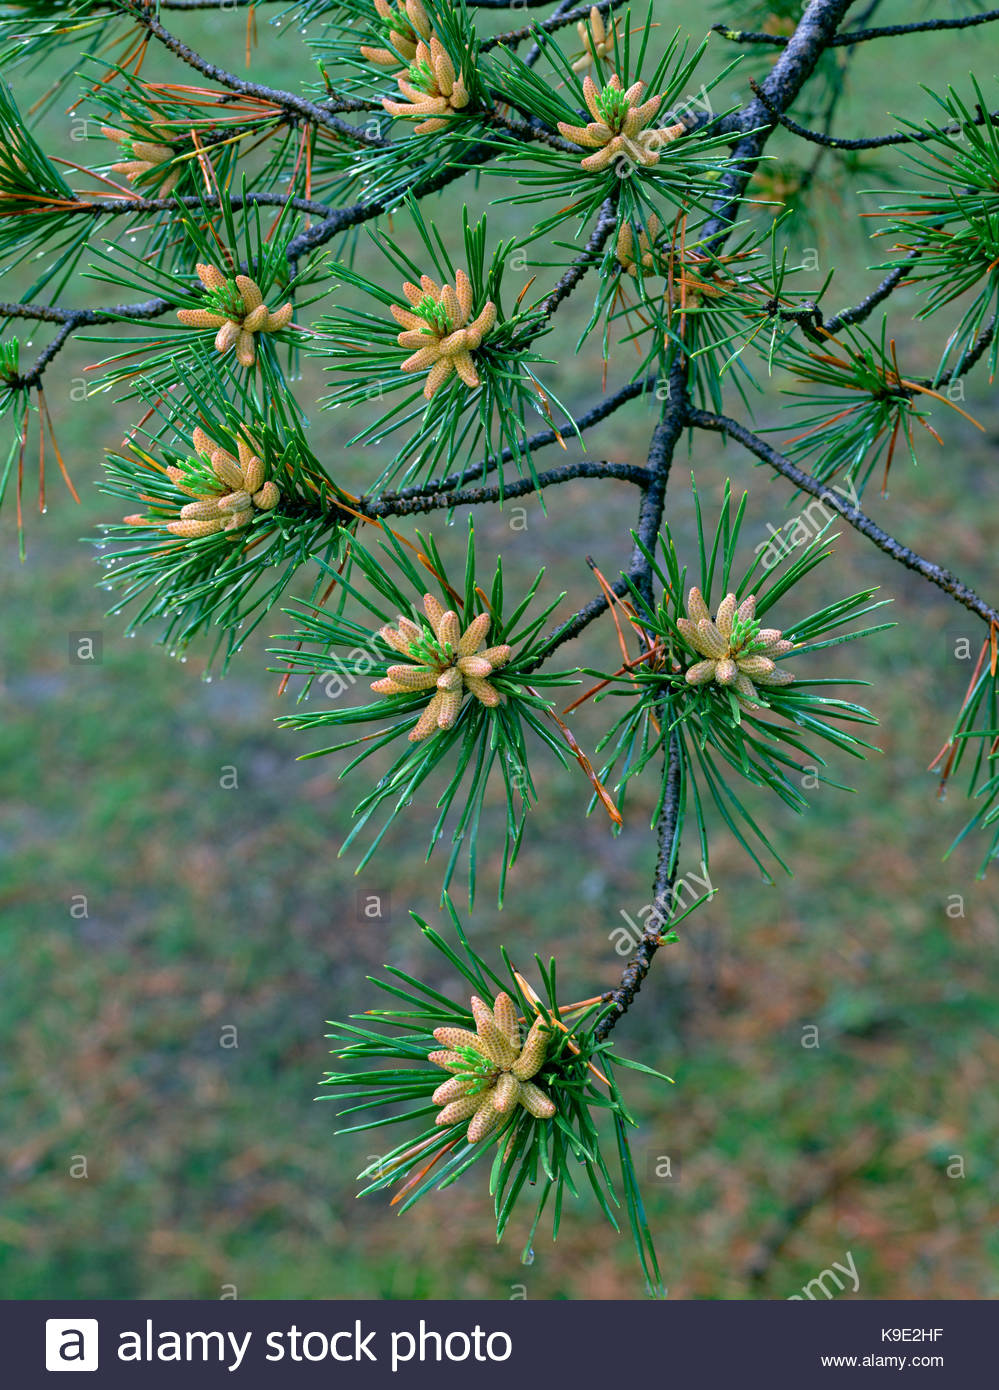 Lodgepole Pine in Spring,Yosemite National Park, California - Stock Image